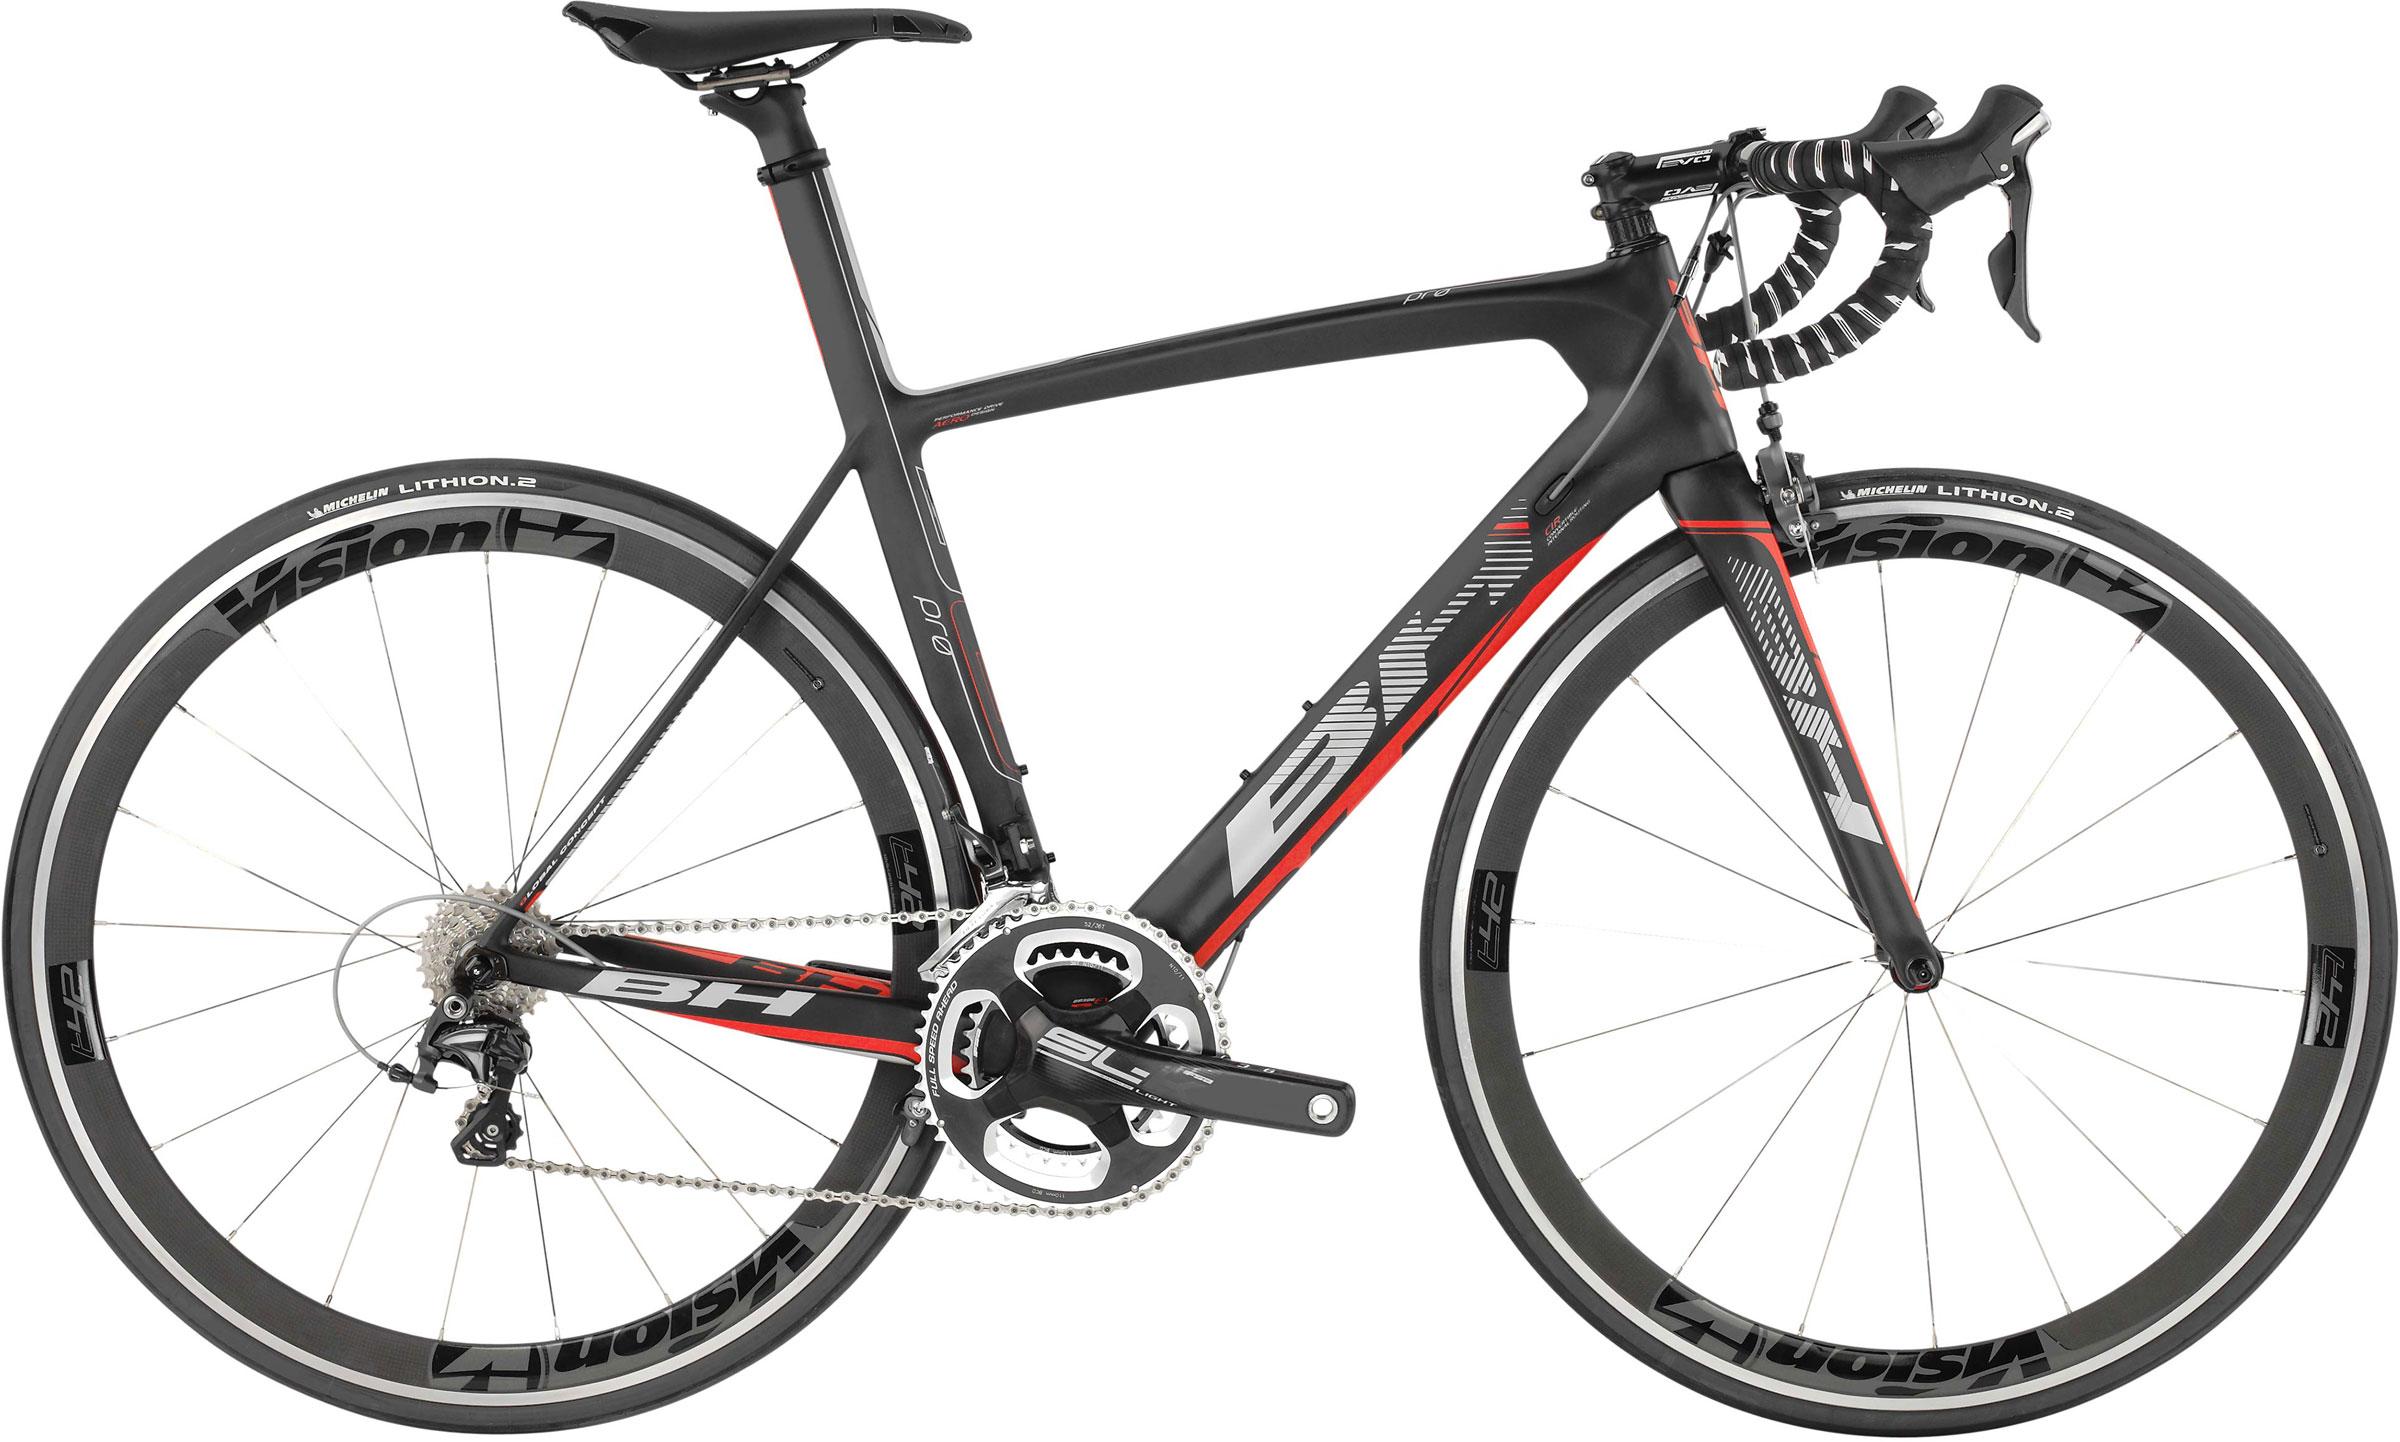 Bh Bikes G6 Pro Ultegra